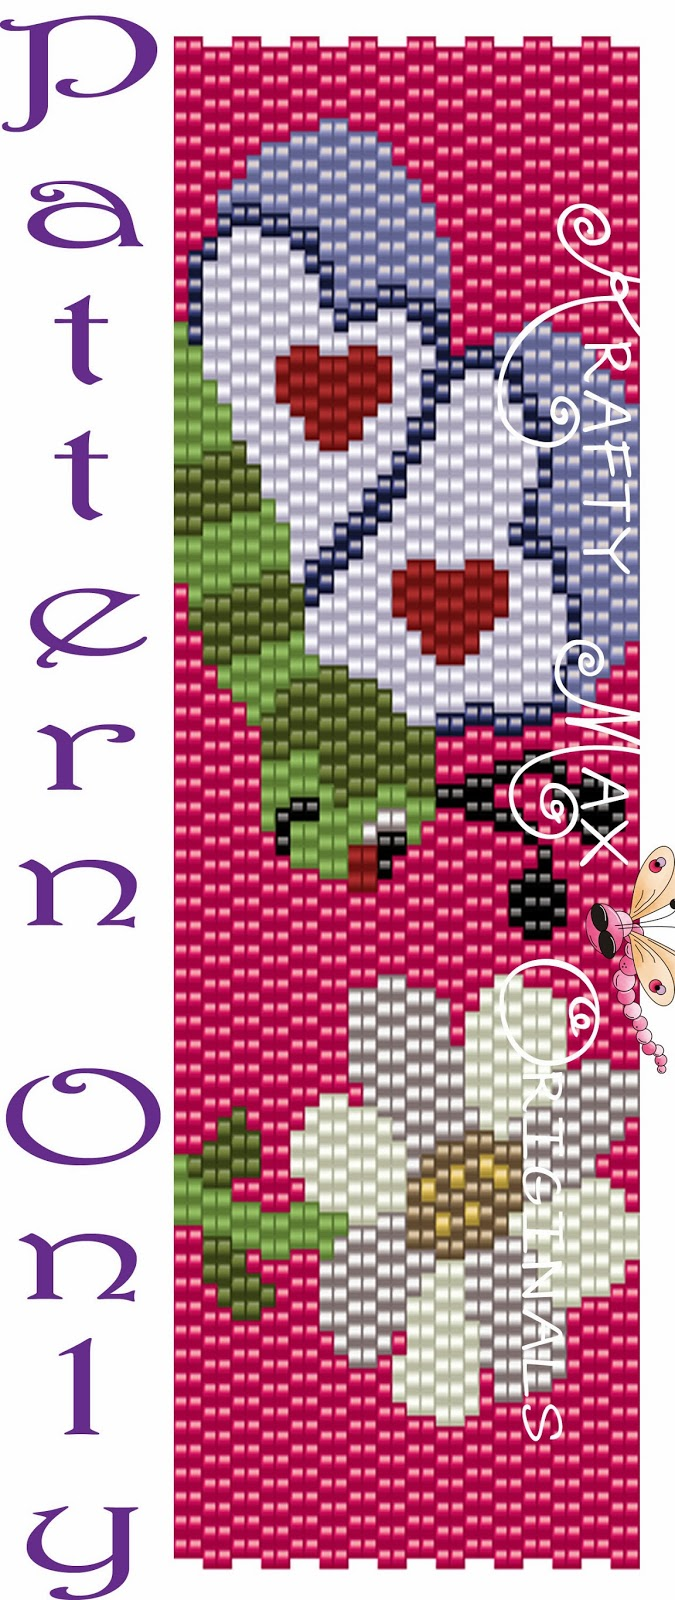 http://www.artfire.com/ext/shop/product_view/8637761